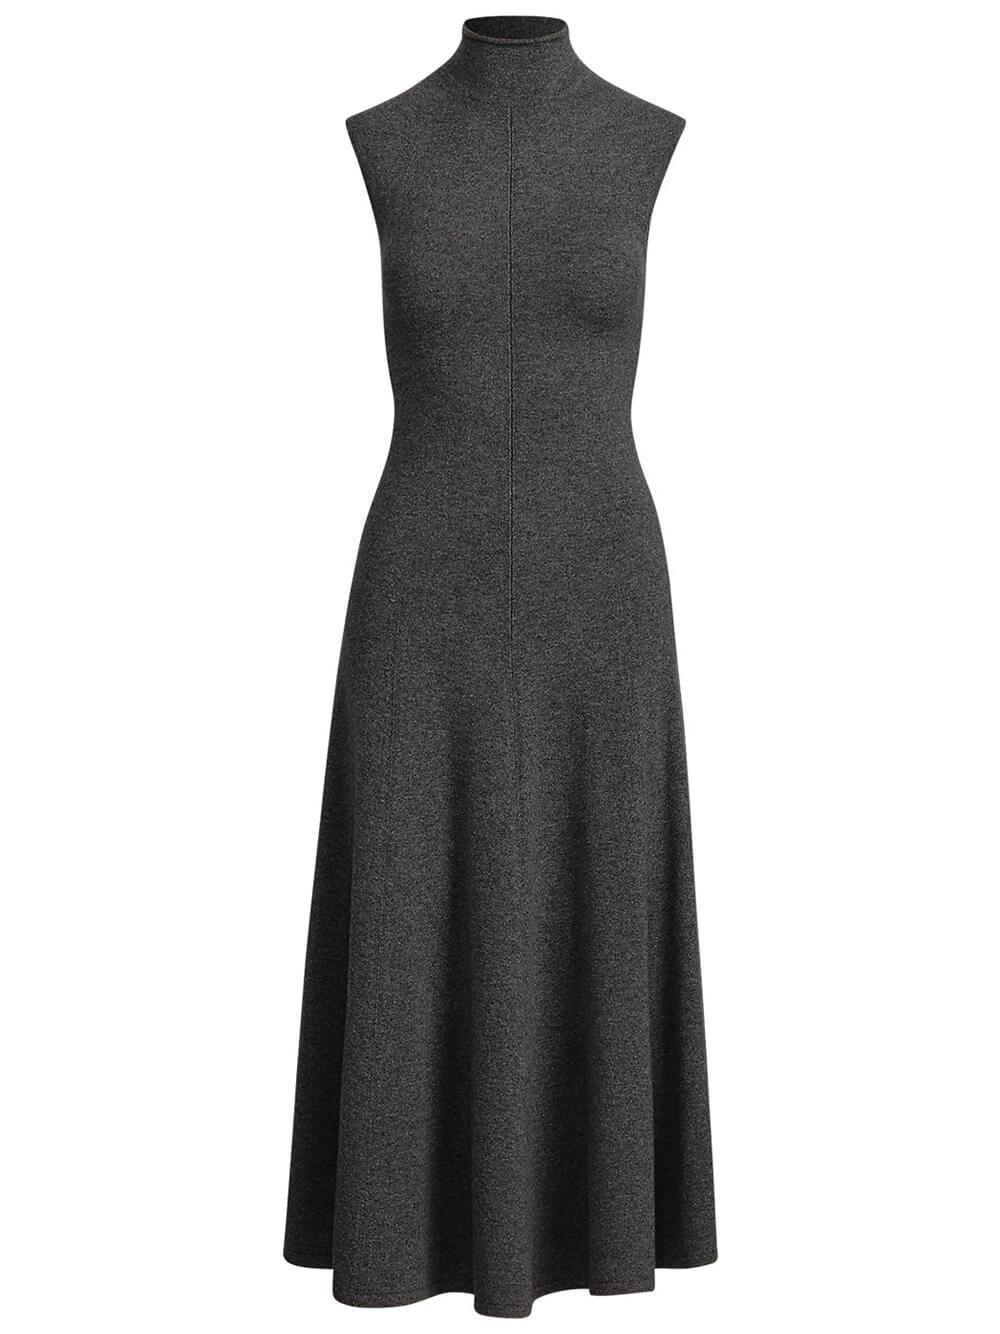 Sleeveless Cashmere Dress Item # 211764250005